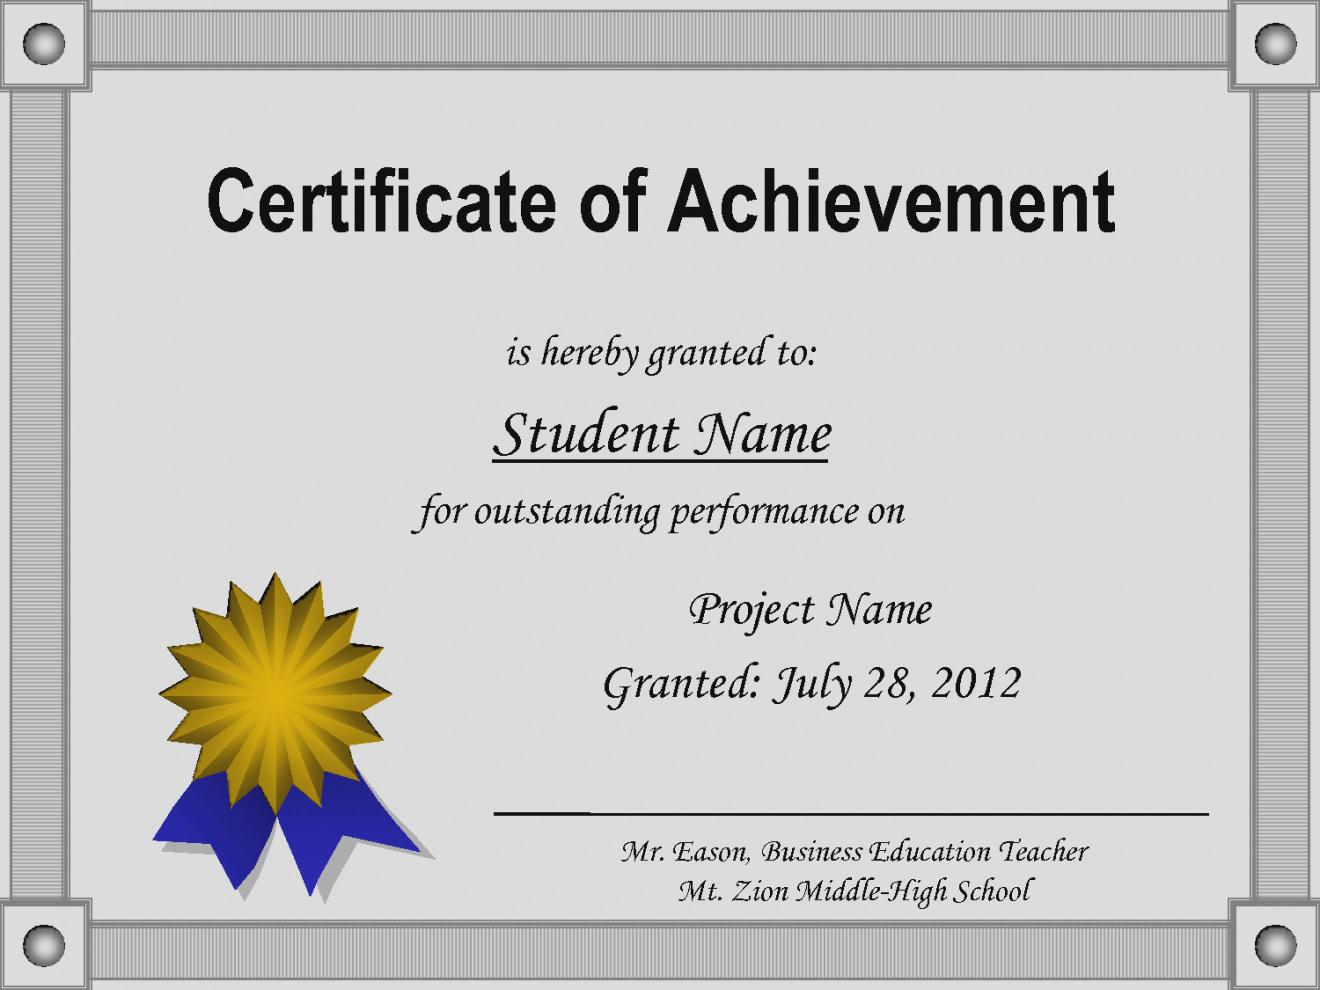 Free Customizable Printable Certificates Of Achievement - Hashtag Bg - Free Printable Certificates Of Accomplishment